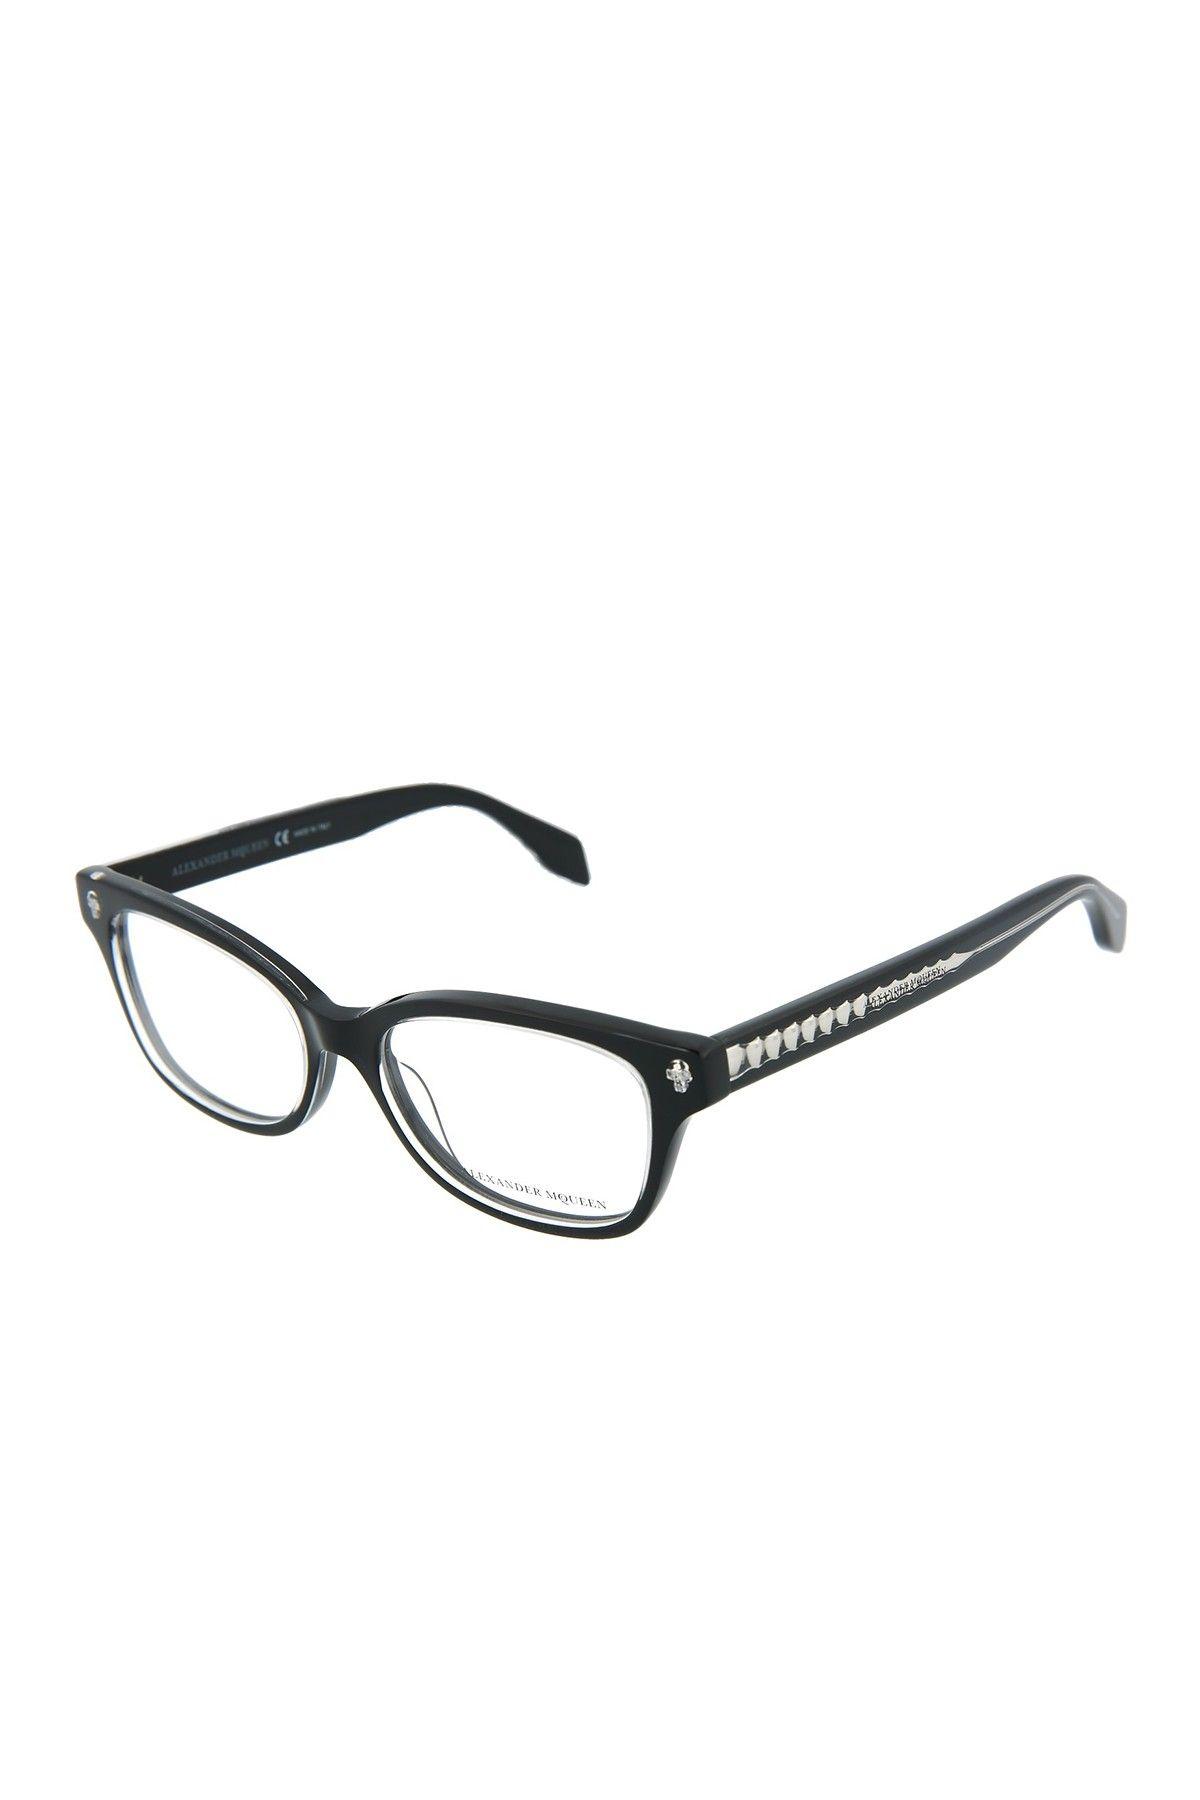 Alexander McQueen   50mm Acetate Optical Frames #nordstromrack